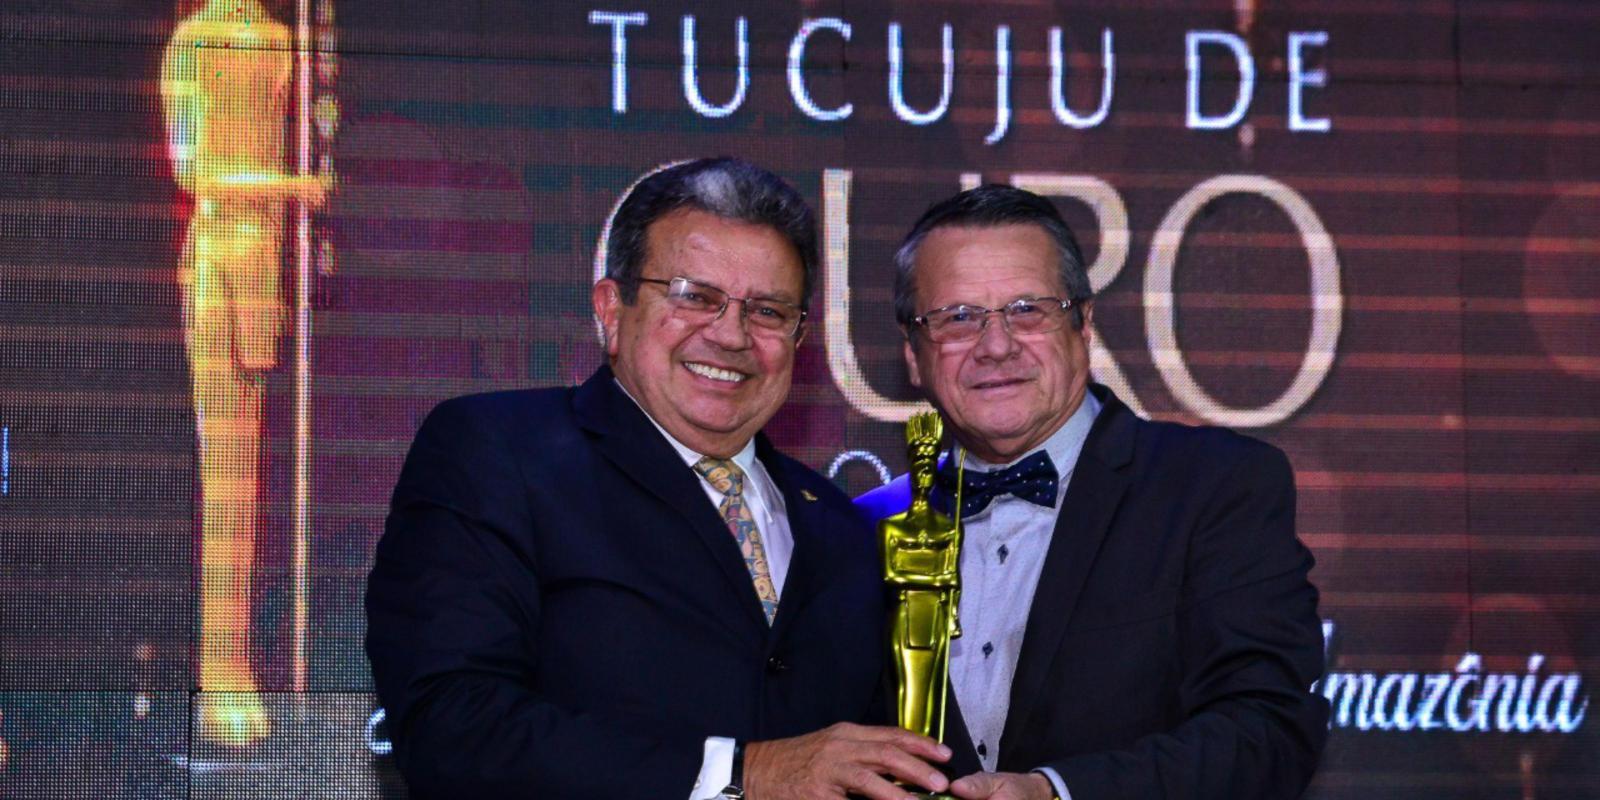 Presidente da FAEAP recebe estatueta Tucuju de Ouro 2018